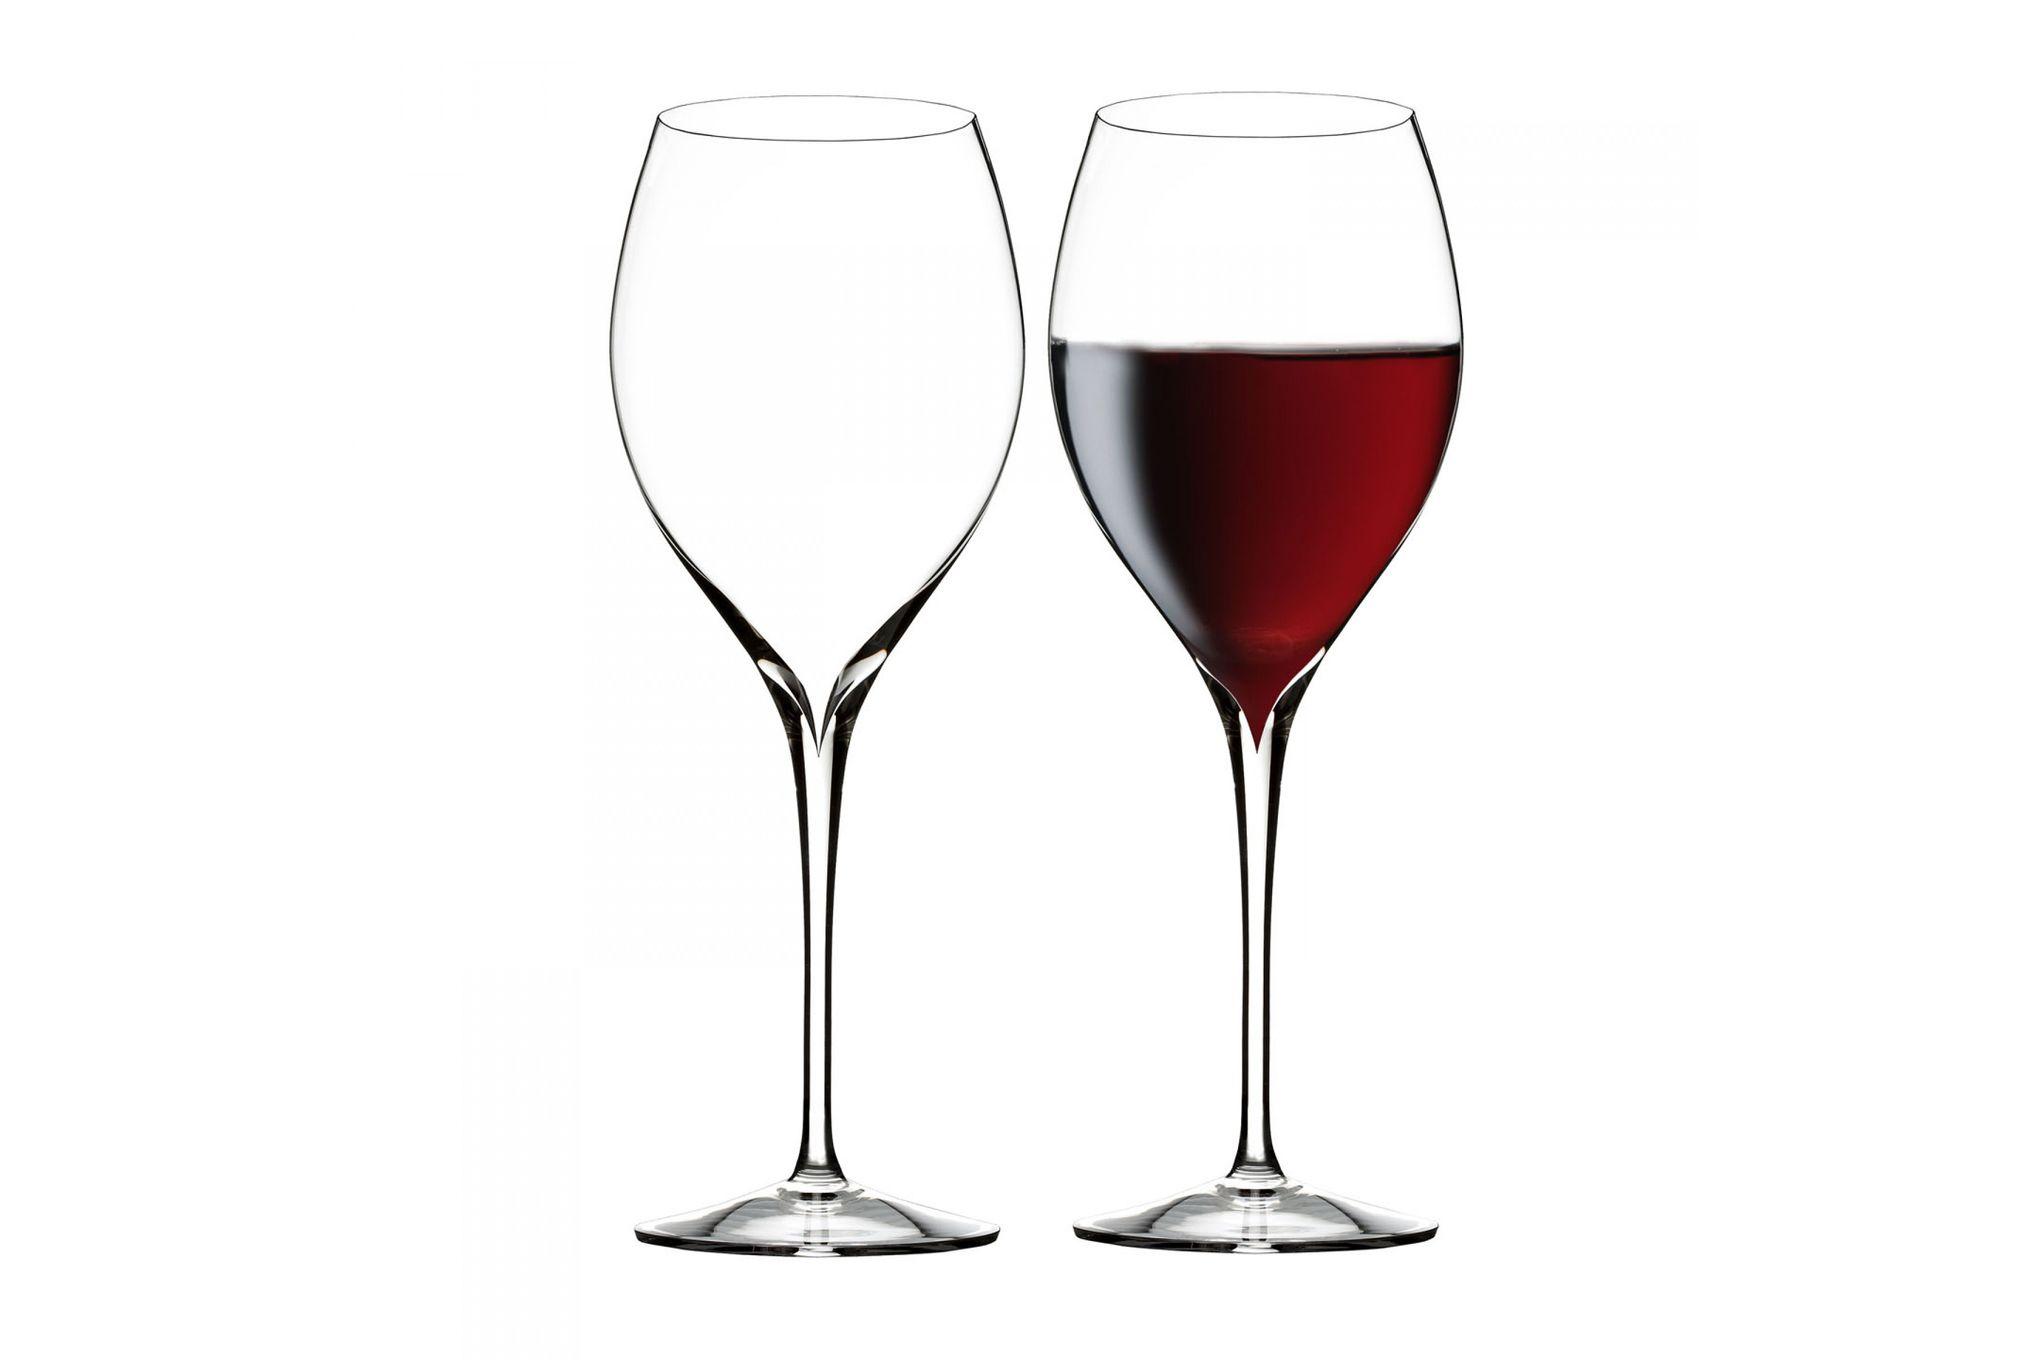 Waterford Elegance Wine Glasses - Set of 2 Shiraz thumb 1